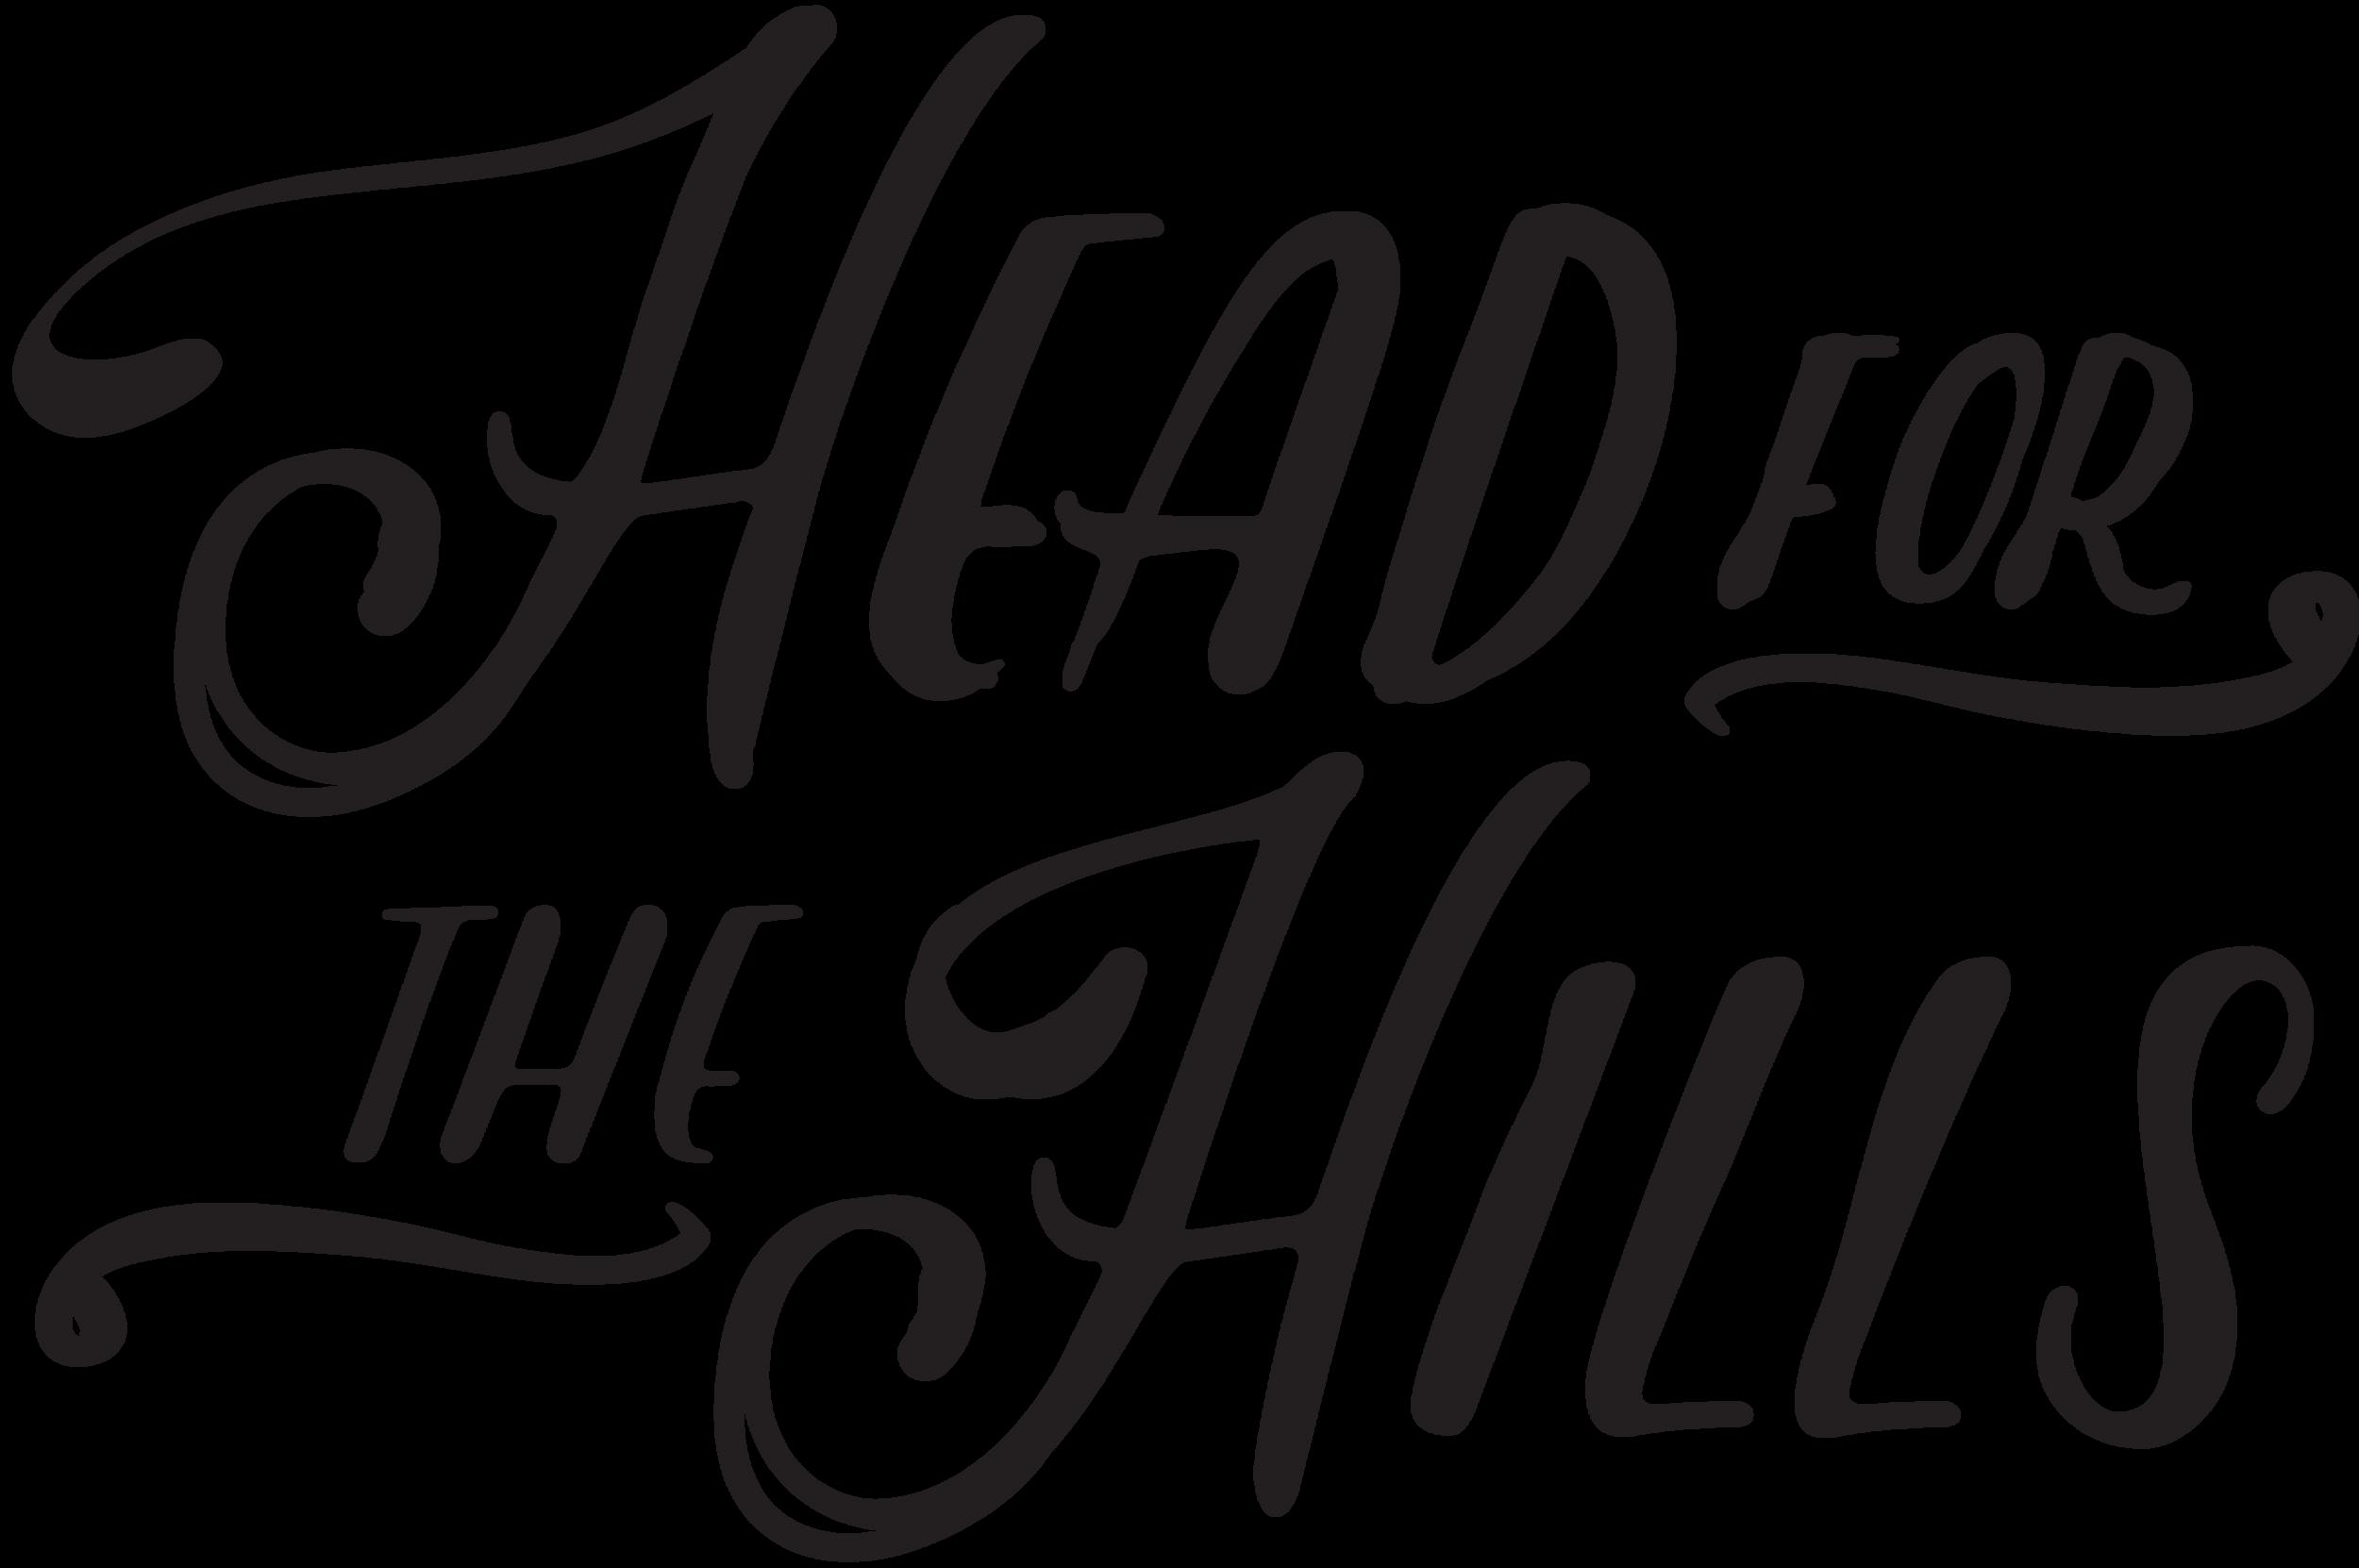 H4TH Text Logo